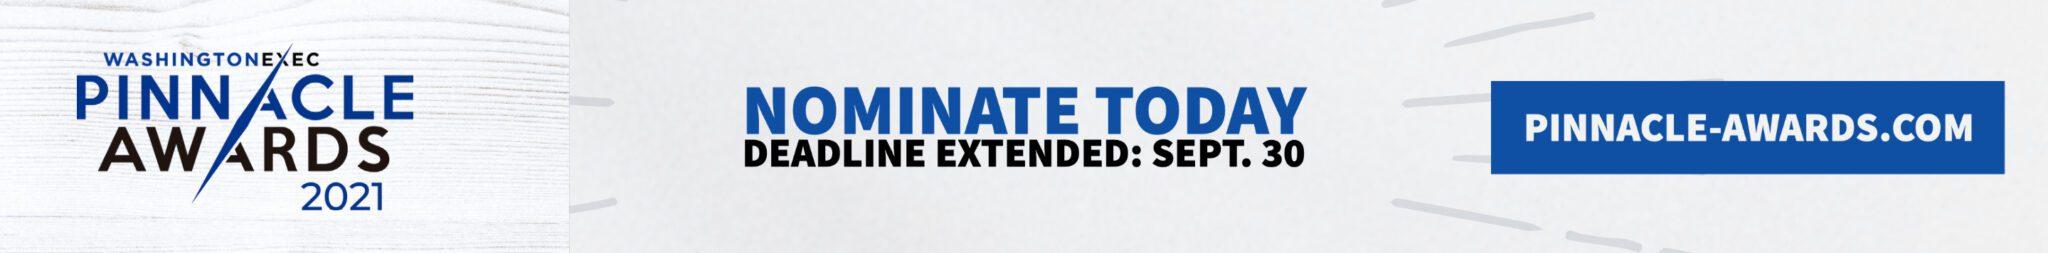 Pinnacle Awards Banner Nomination Deadline Extended